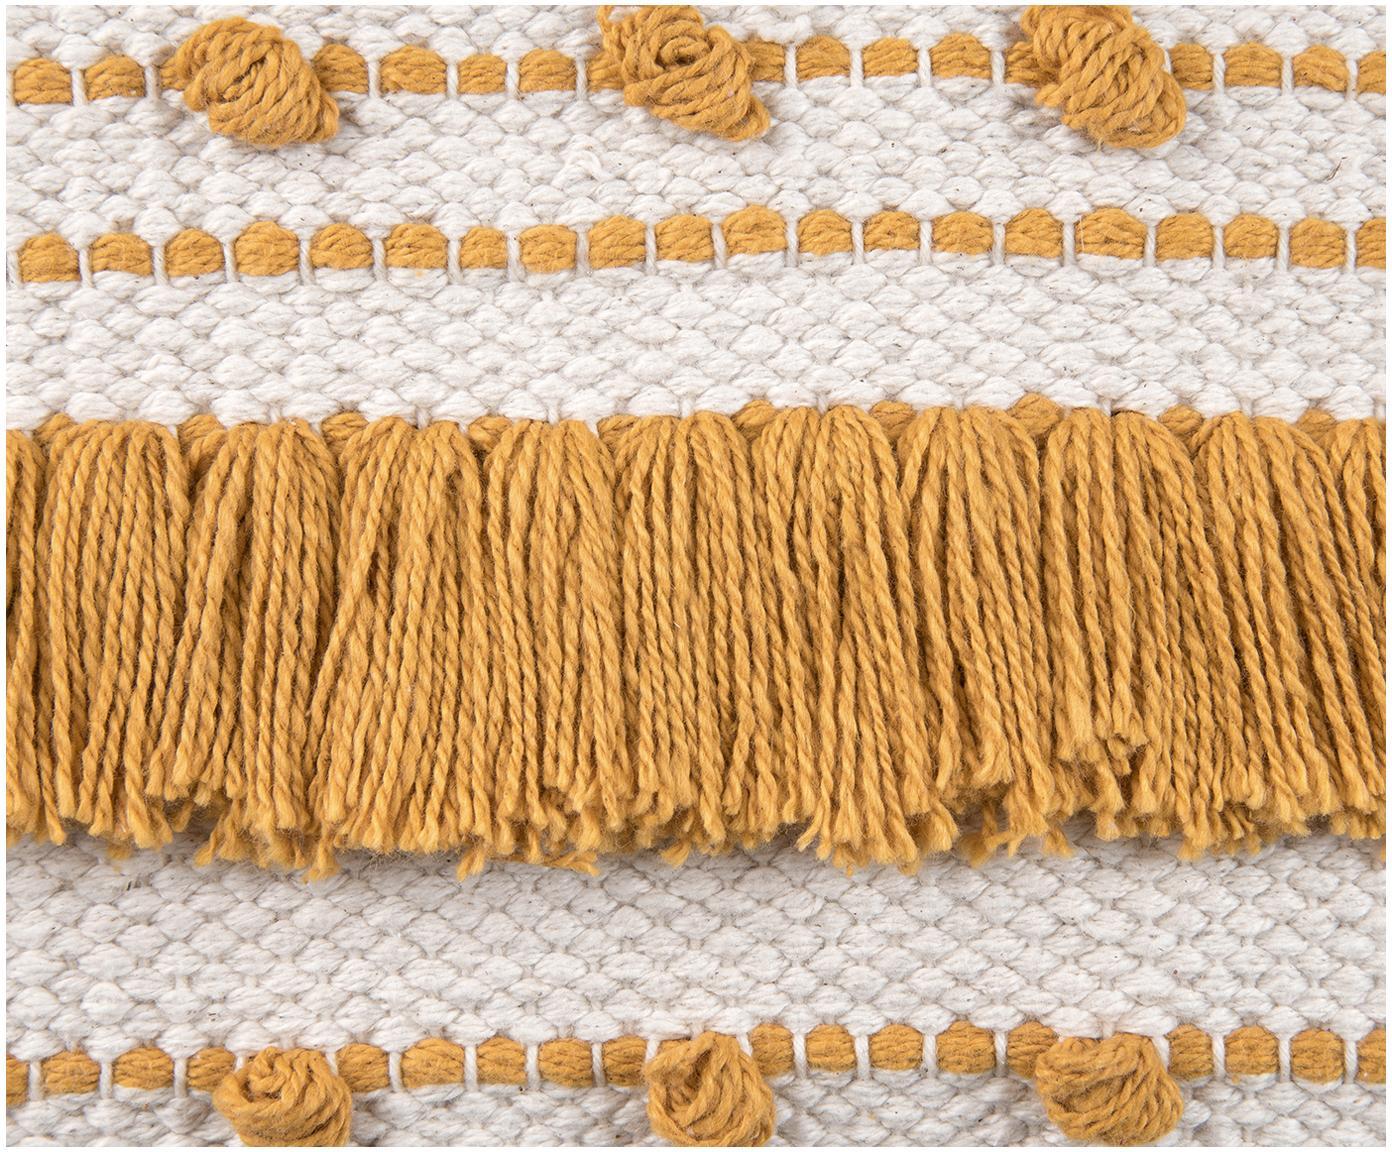 Kussenhoes Tulika, 100% katoen, Geel, ecru, 45 x 45 cm